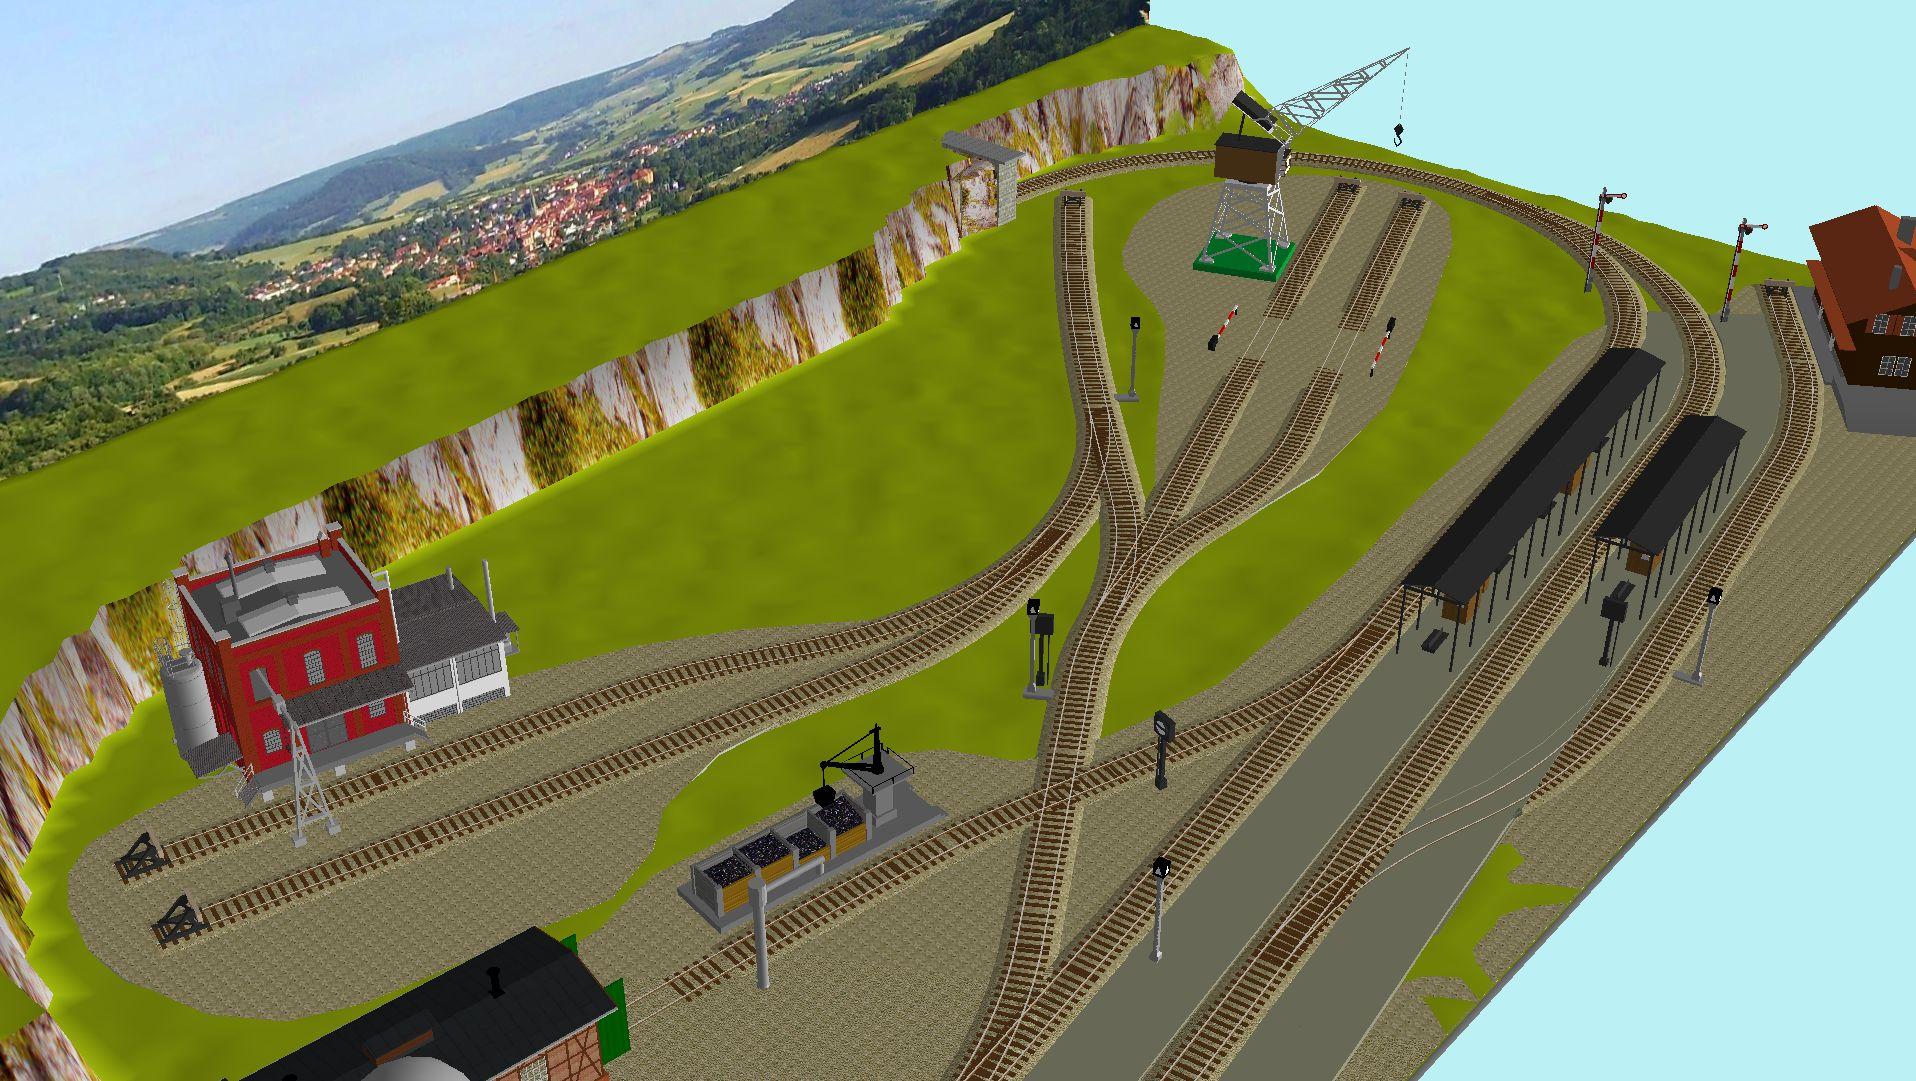 'ALBA Modellbahnpraxis' Band 1, Plan 5 Amp-1_5_m-gleis_jrg_aivks9